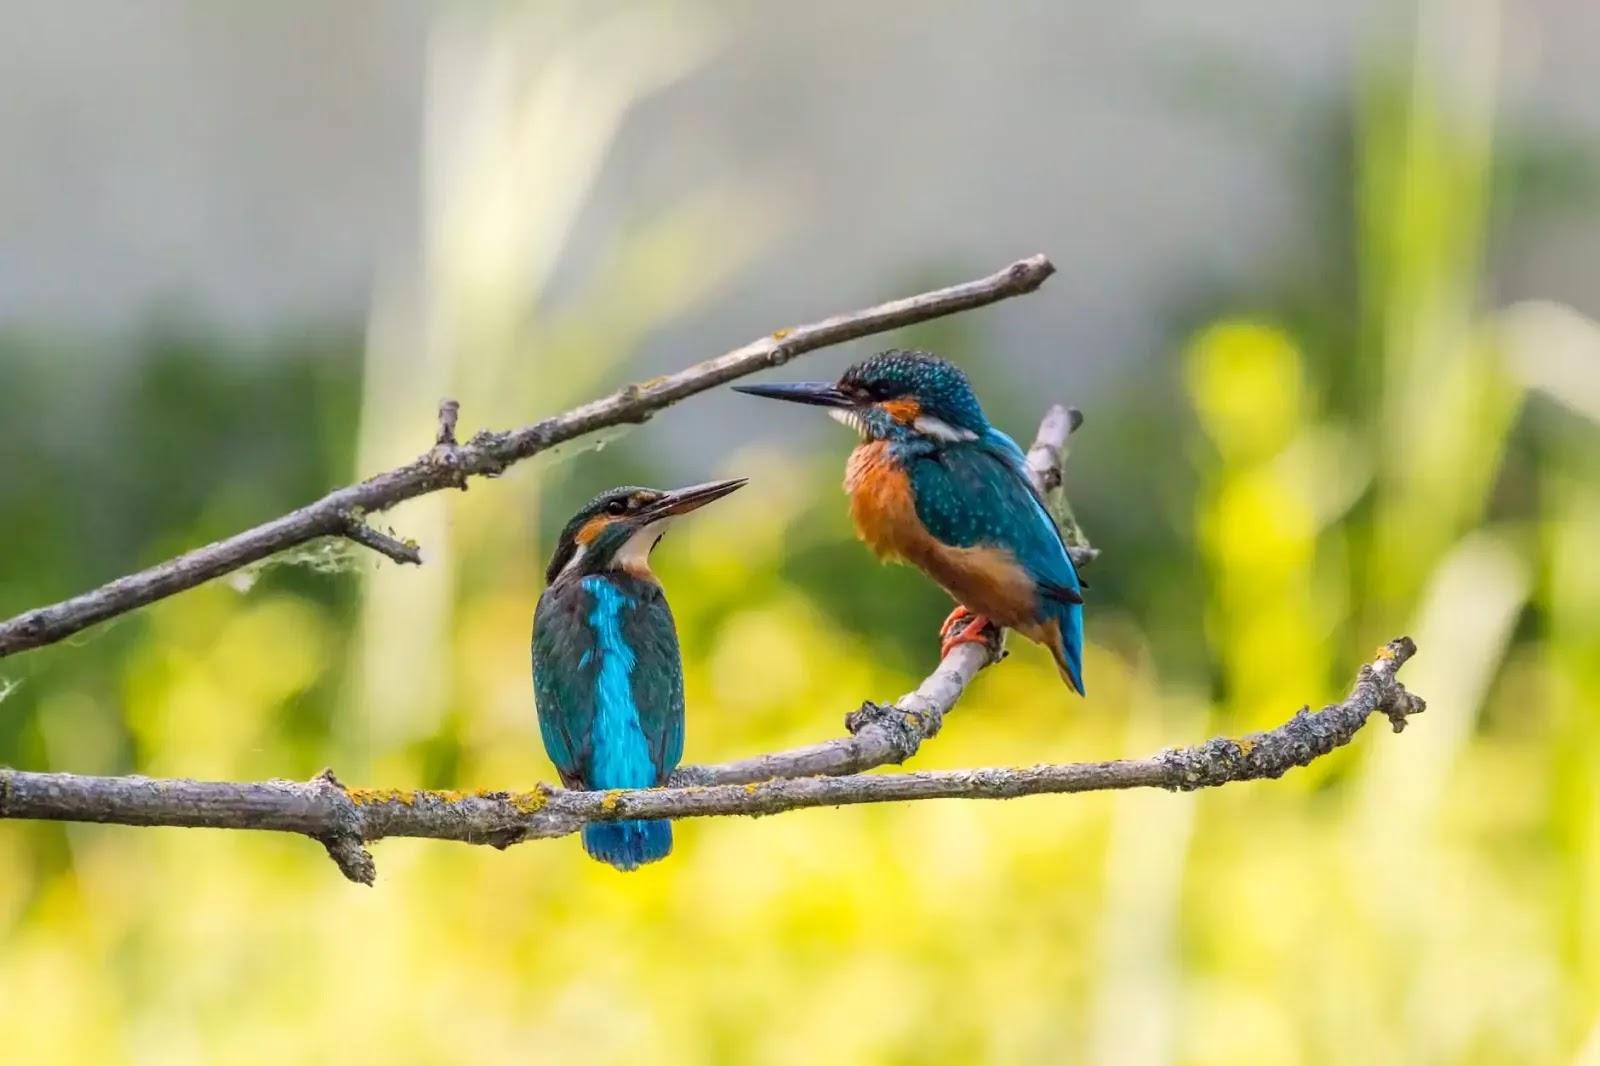 Love birds hd wallpaper free download, African love birds hd wallpaper, Love birds wallpaper hd 1080p